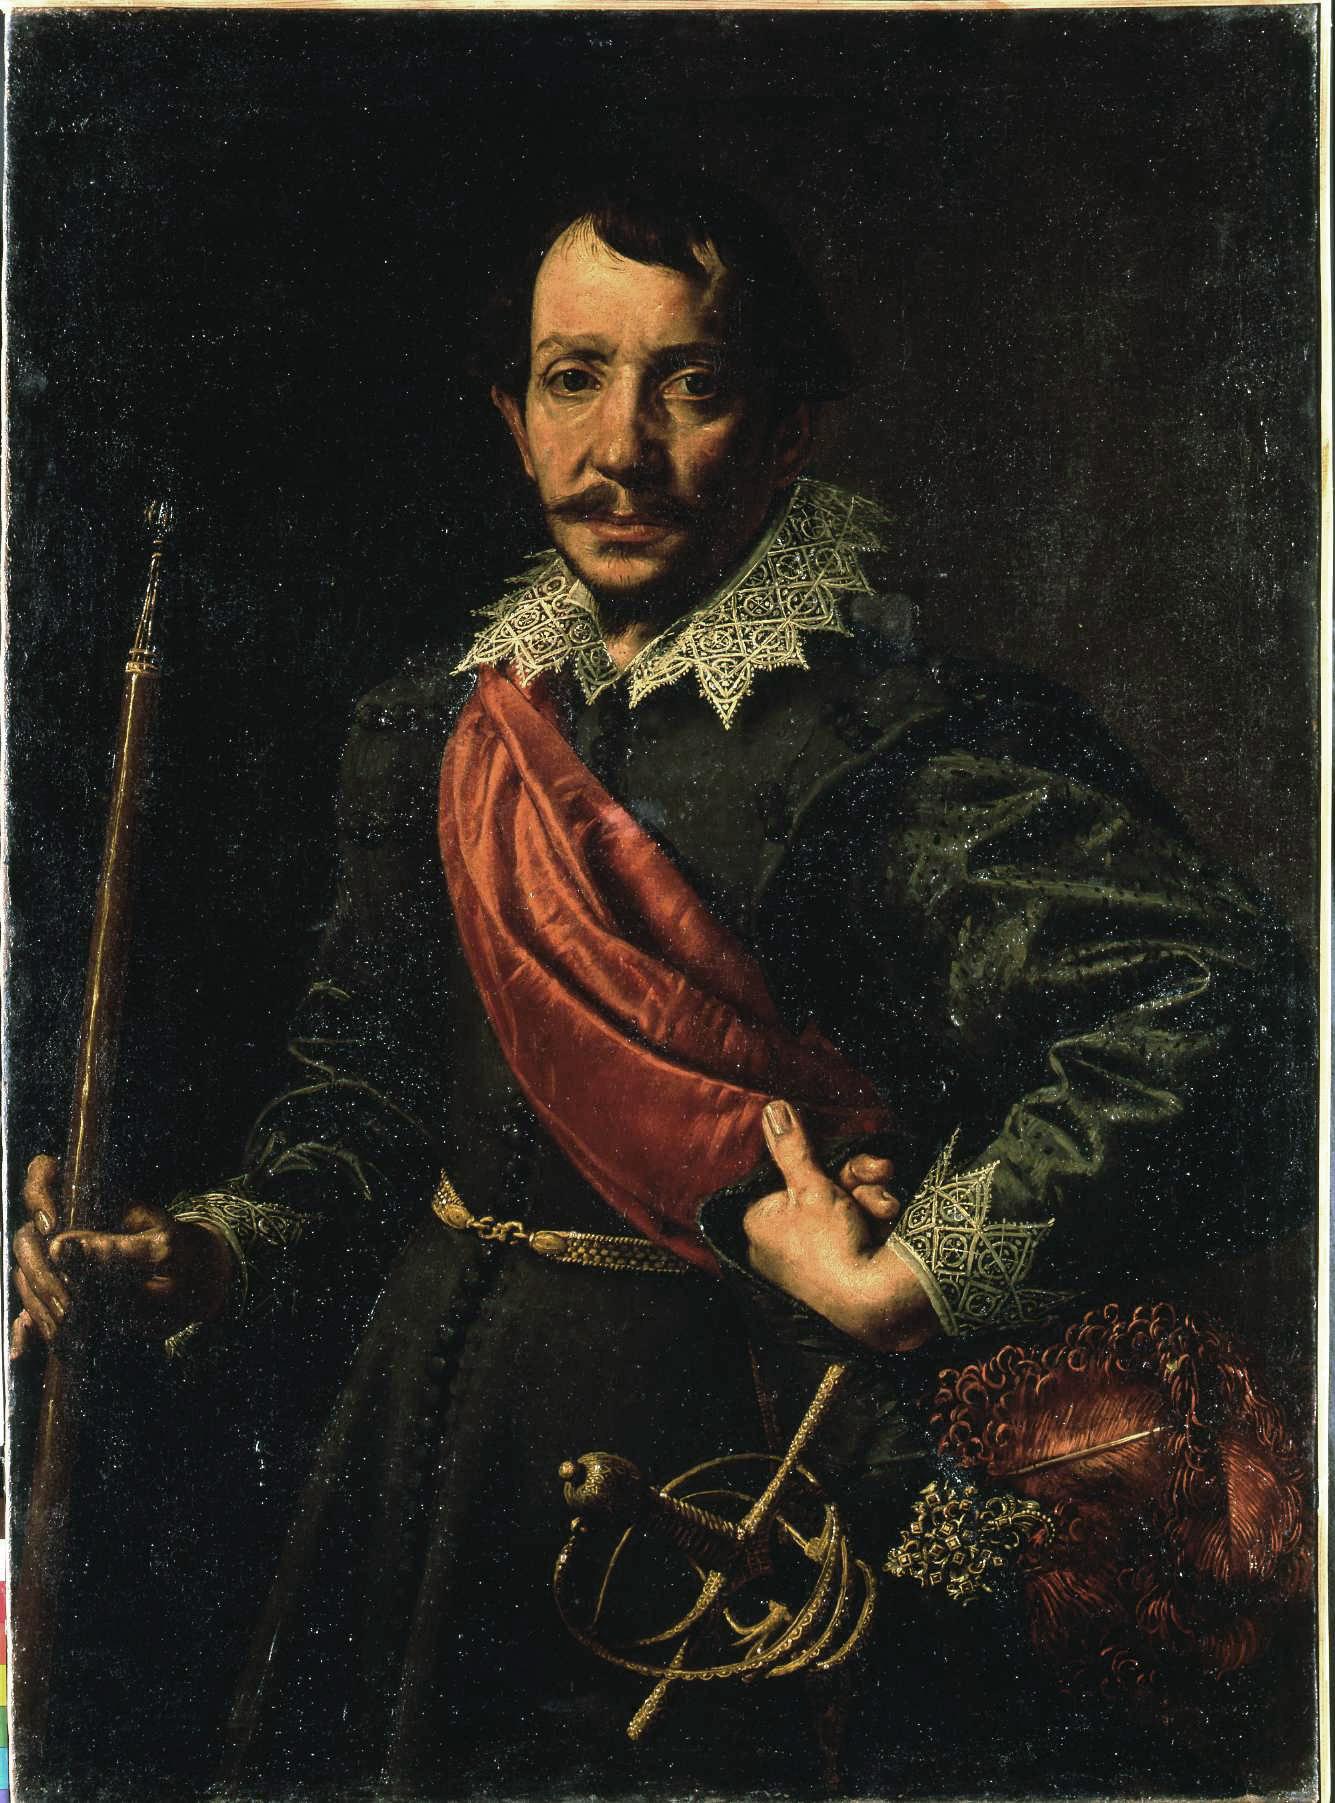 Portrait of a Gentleman [Signor Nazzari?]